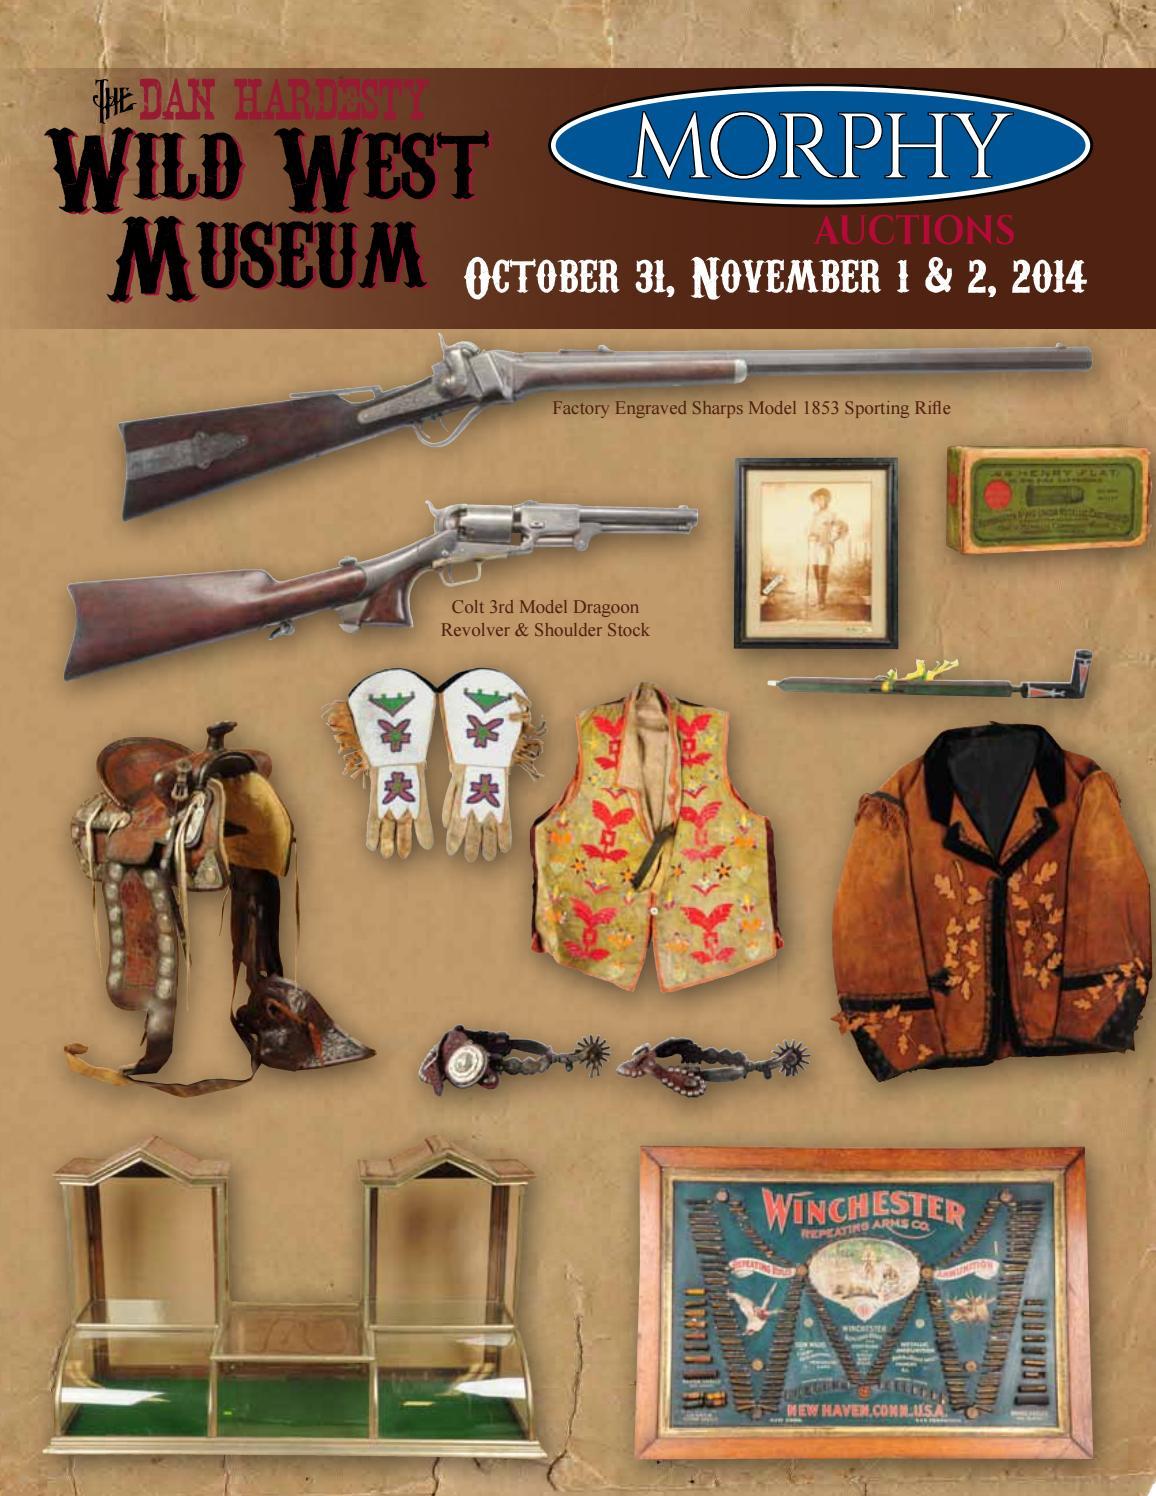 2014 October 31, November 1 & 2 The Dan Hardesty Wild West